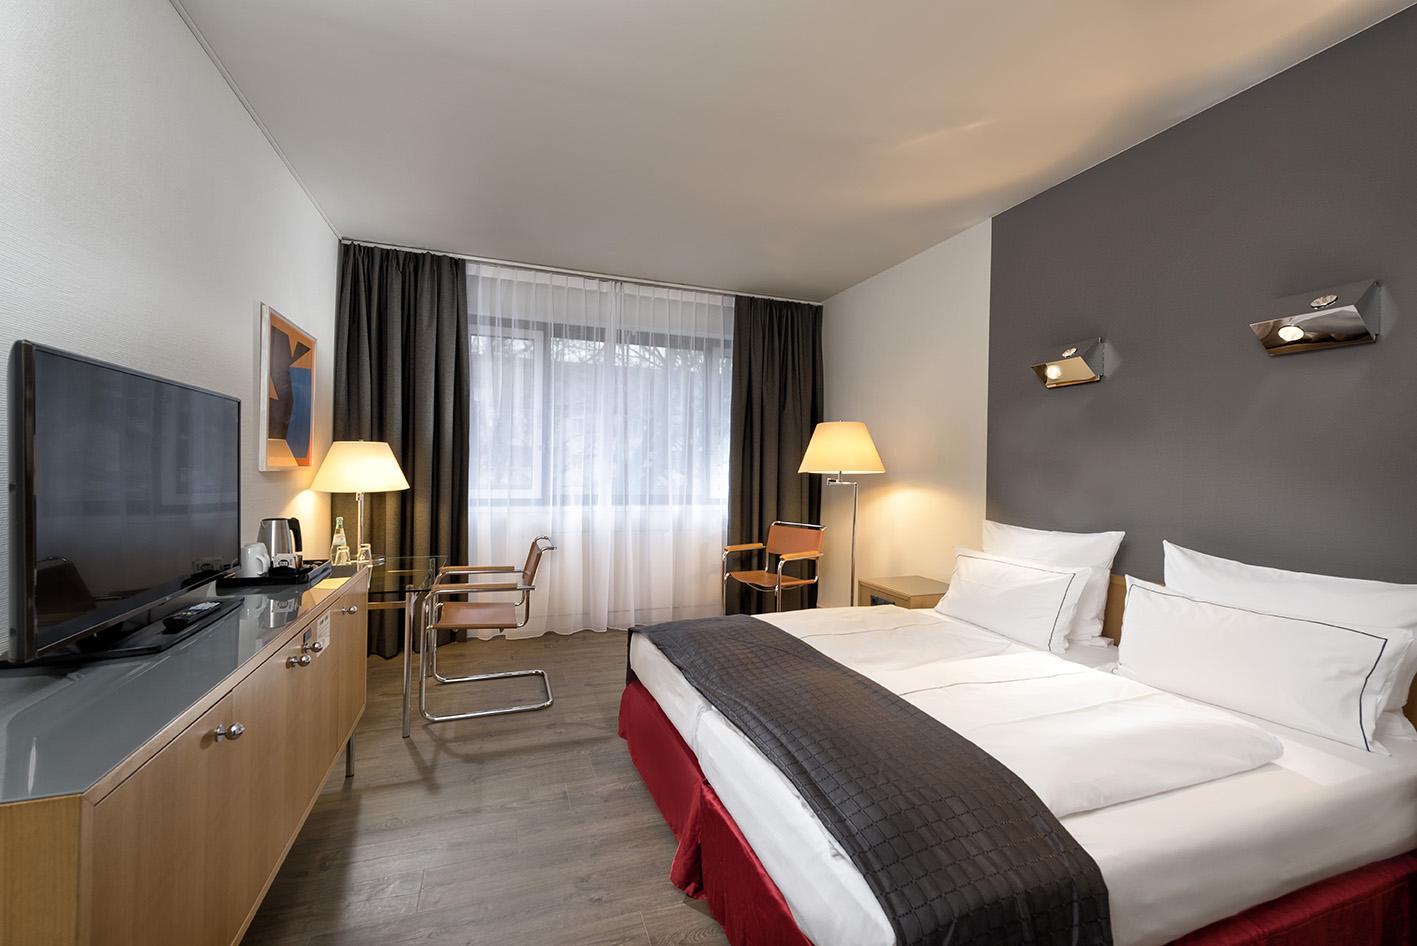 4 hotelzimmer berlin holiday inn hotel berlin city west for Zimmer berlin